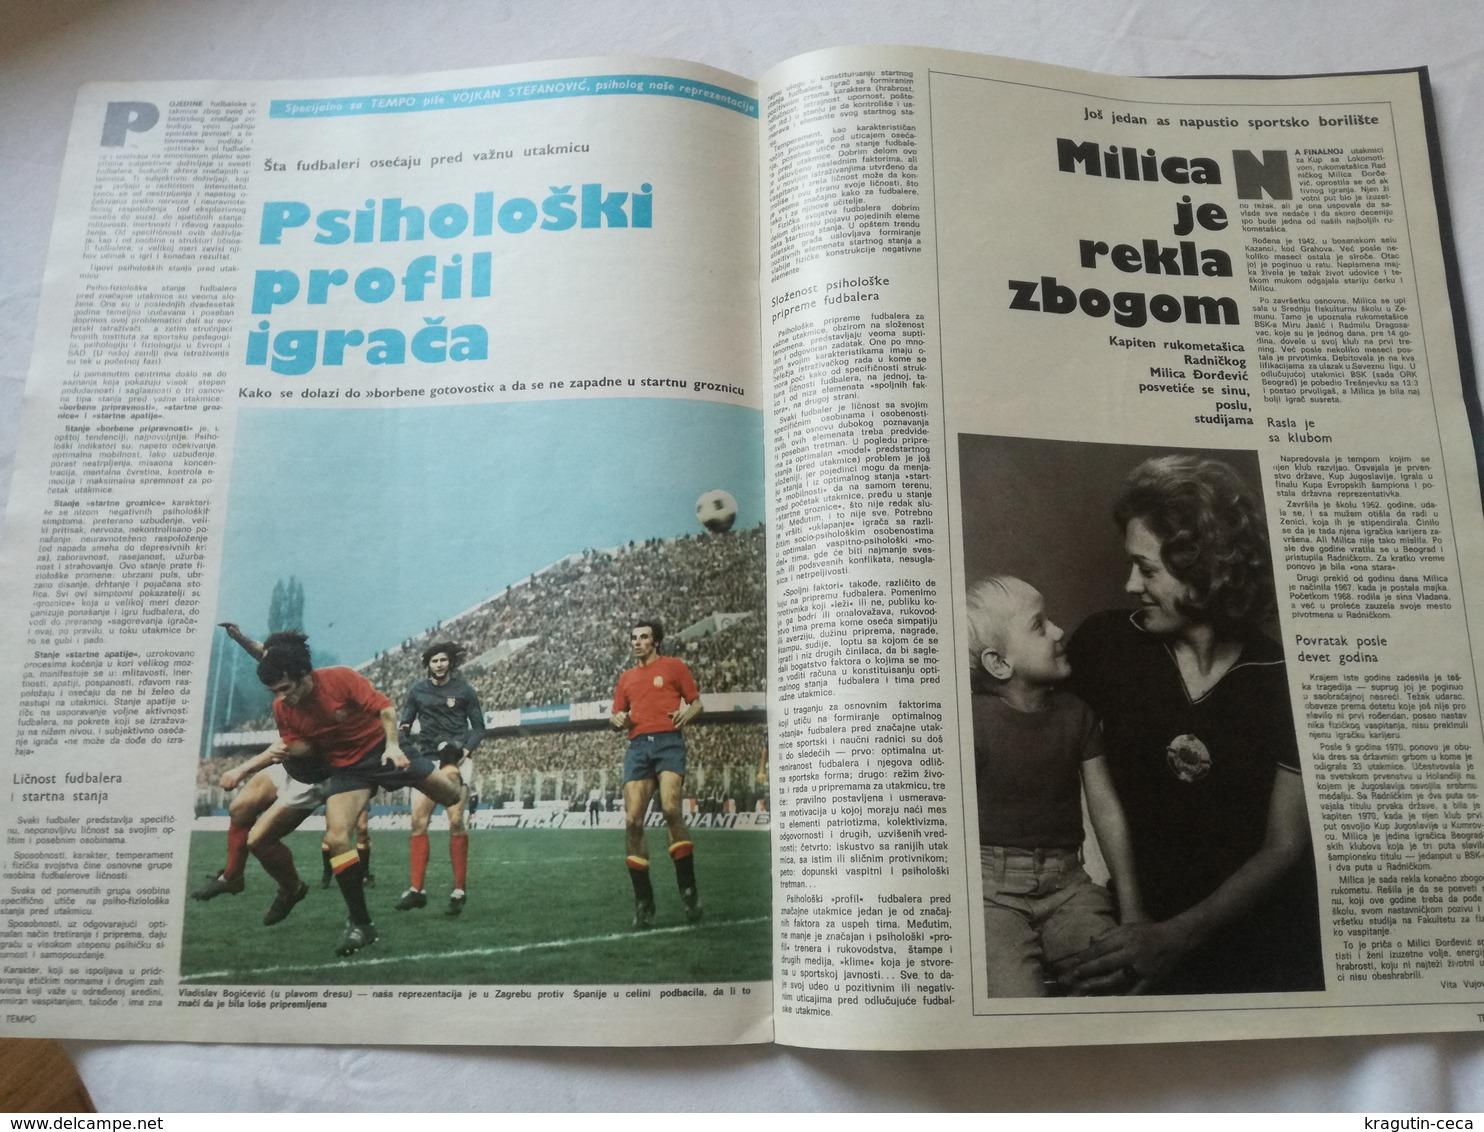 1974 TEMPO YUGOSLAVIA SERBIA SPORT FOOTBALL MAGAZINE NEWSPAPERS BASKETBALL OLYMPIC GAMES VINKO JELOVAC HANDBALL RADNICKI - Deportes